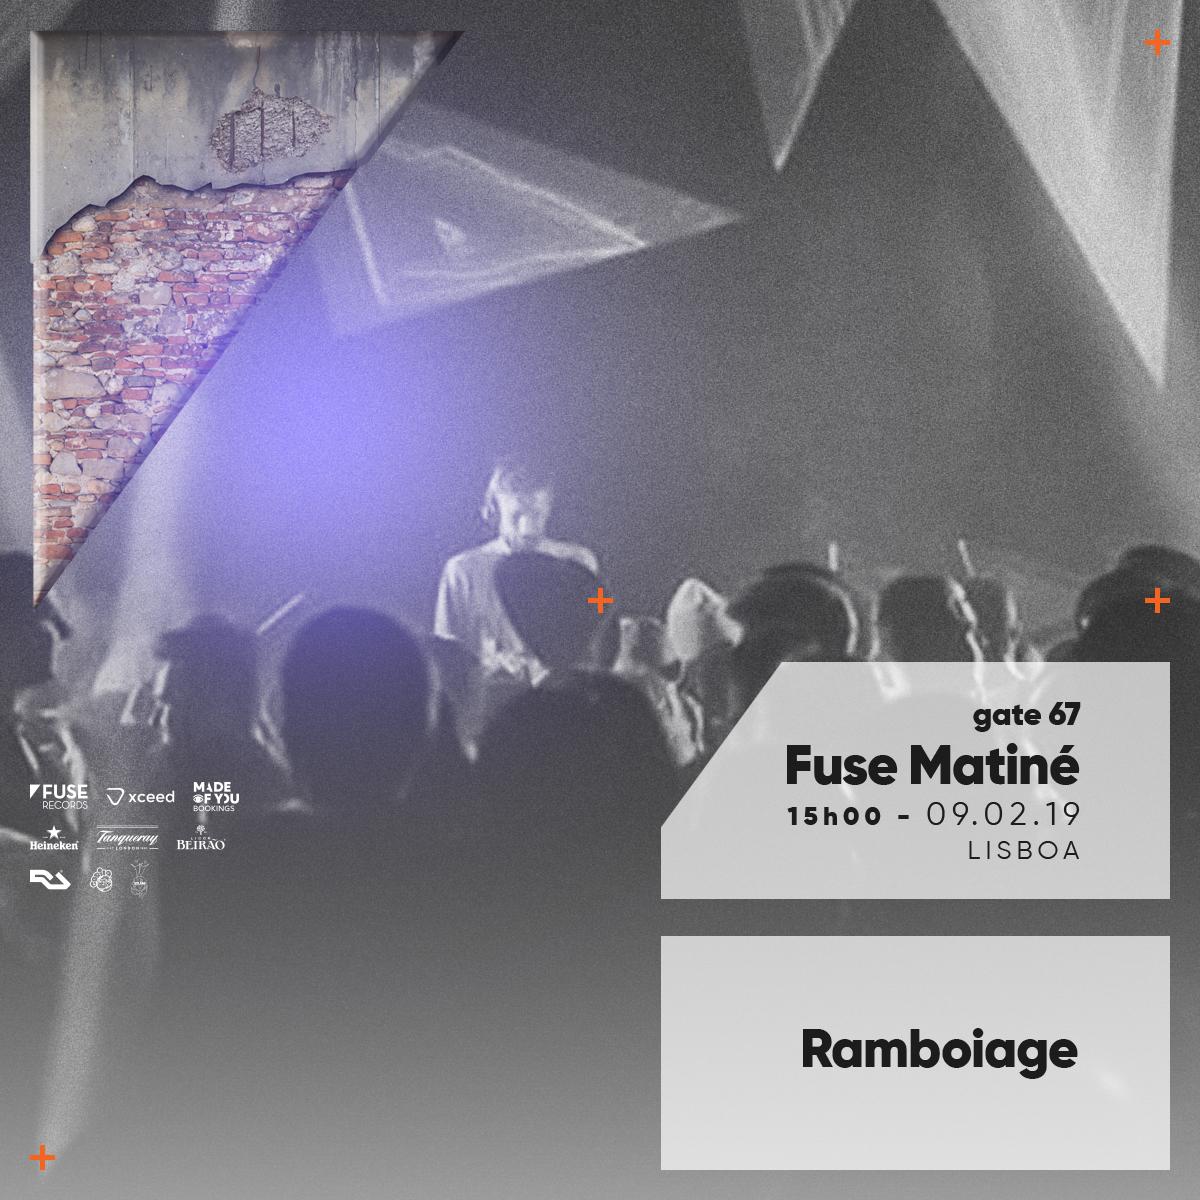 FuseMatine_090219_Profile_Ramboiage.jpg